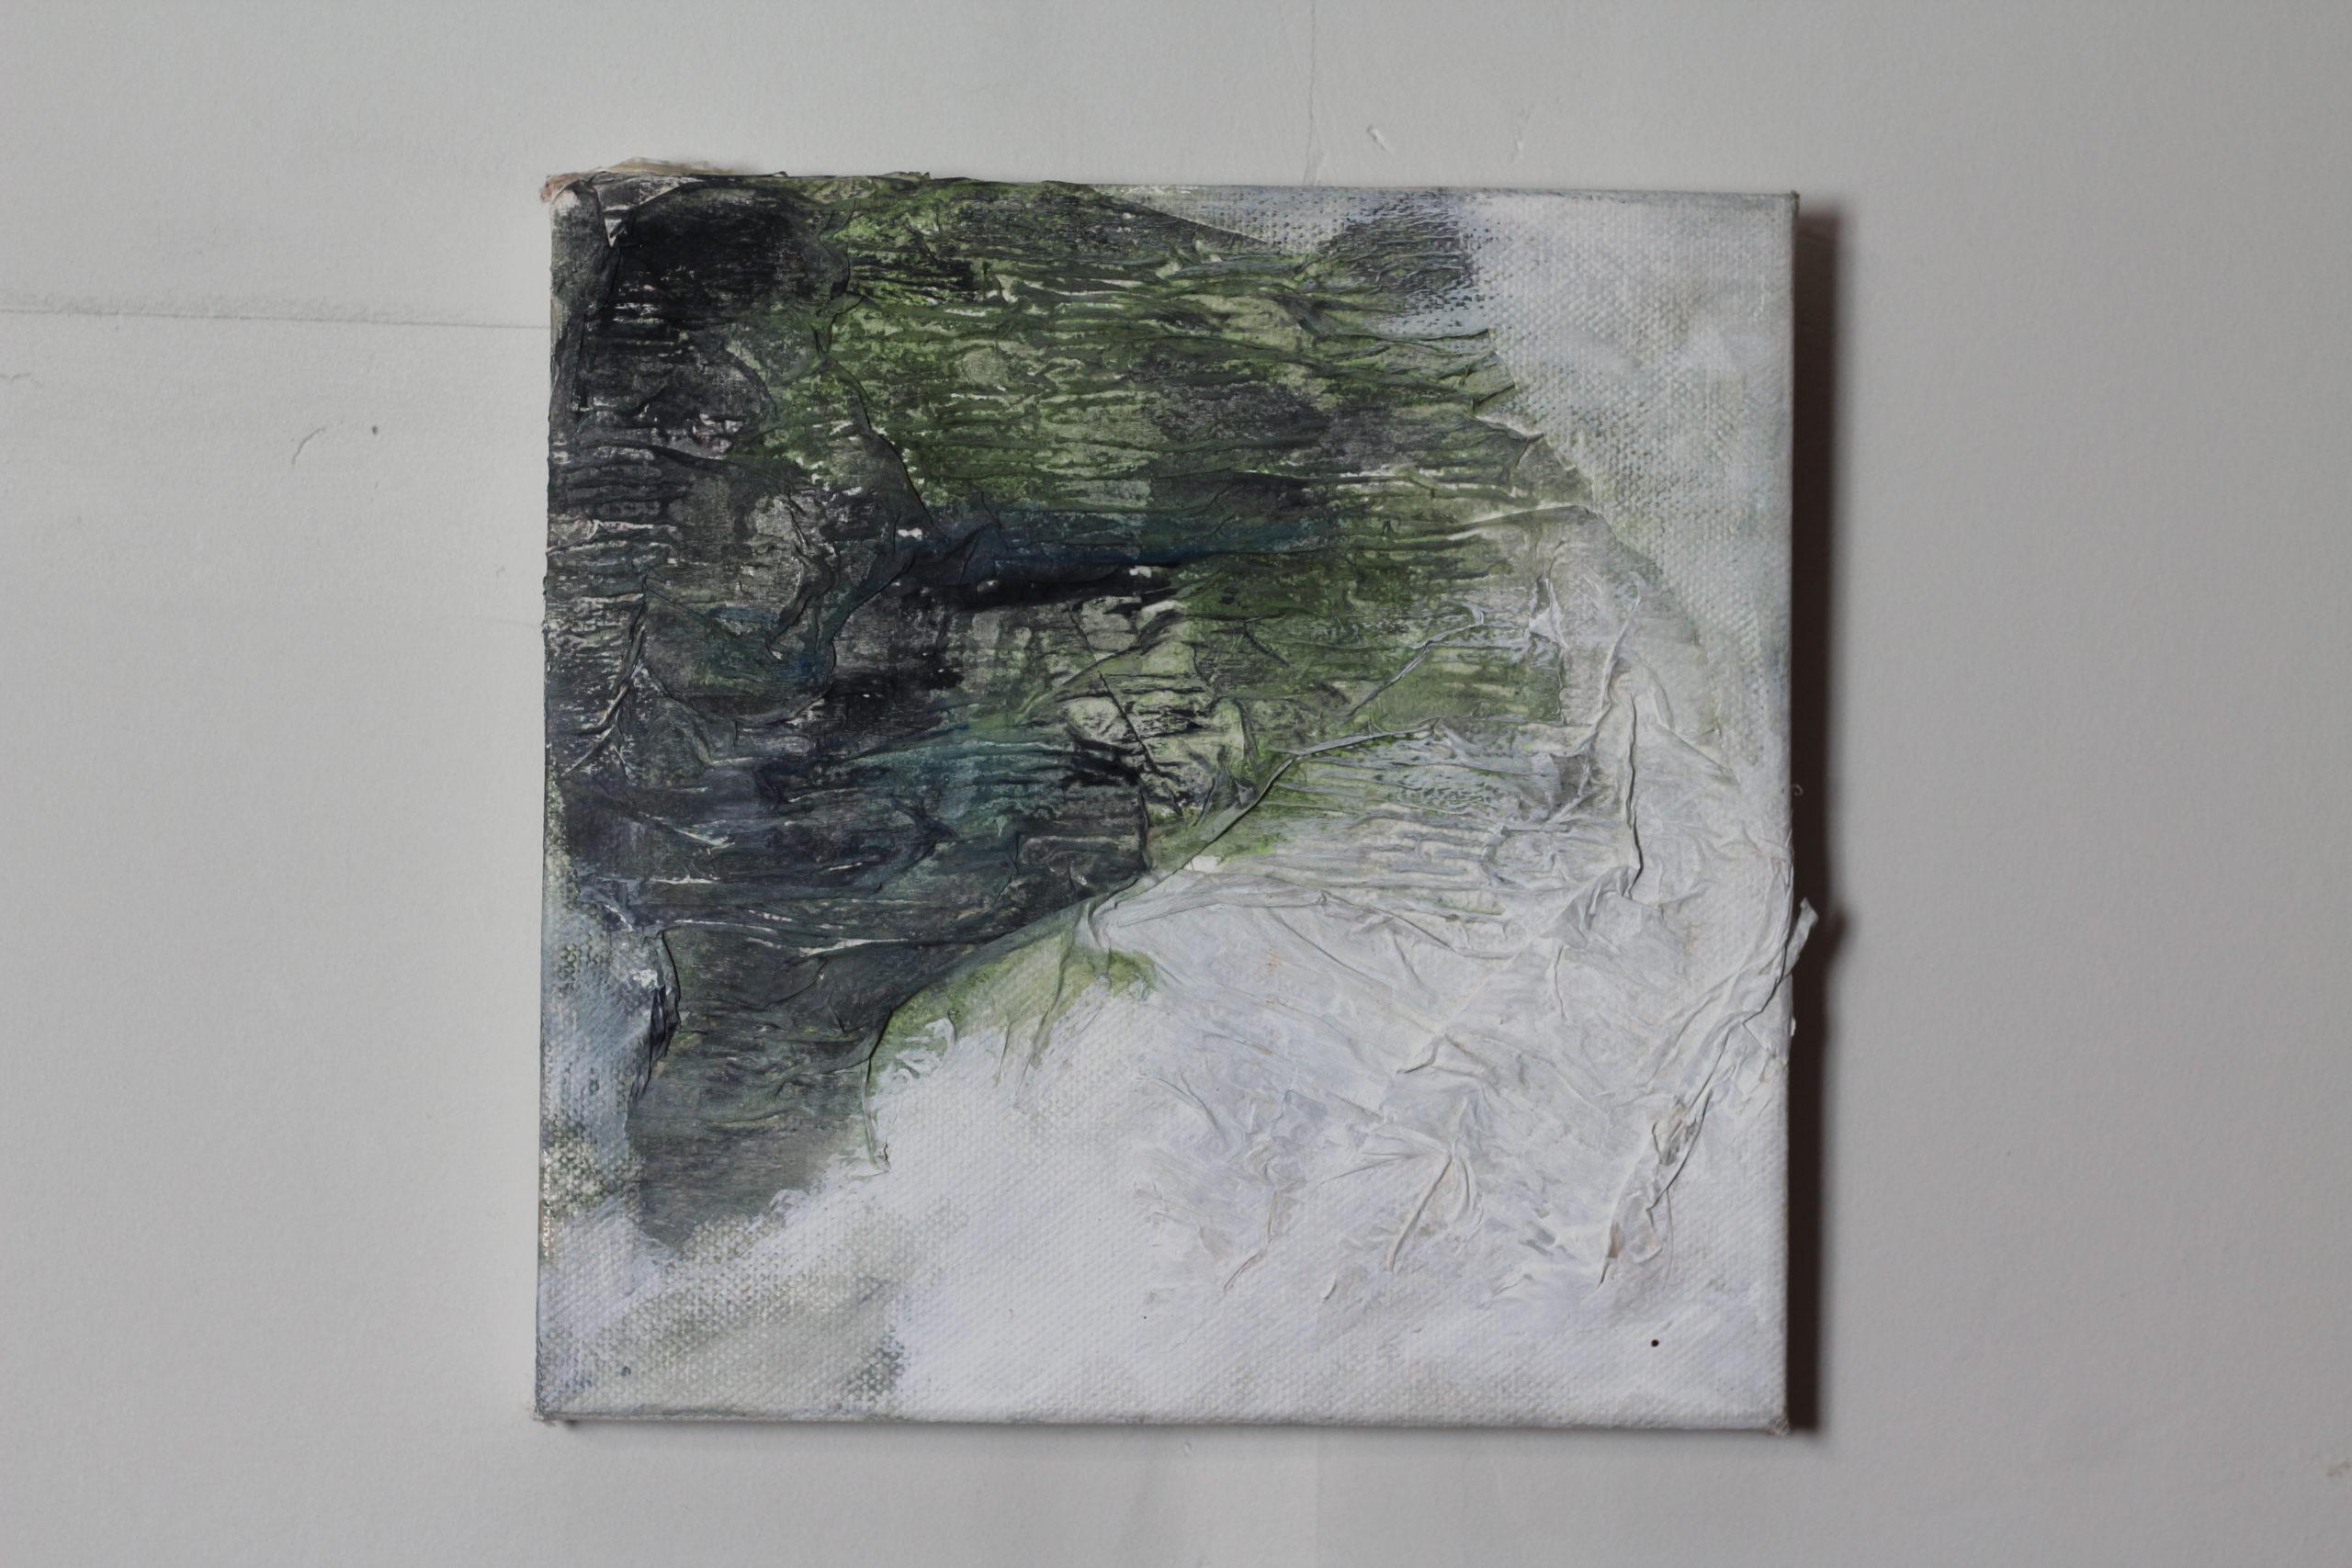 Peinture : Nature 8 20x20 (Véronique Fuchs-Sublon)